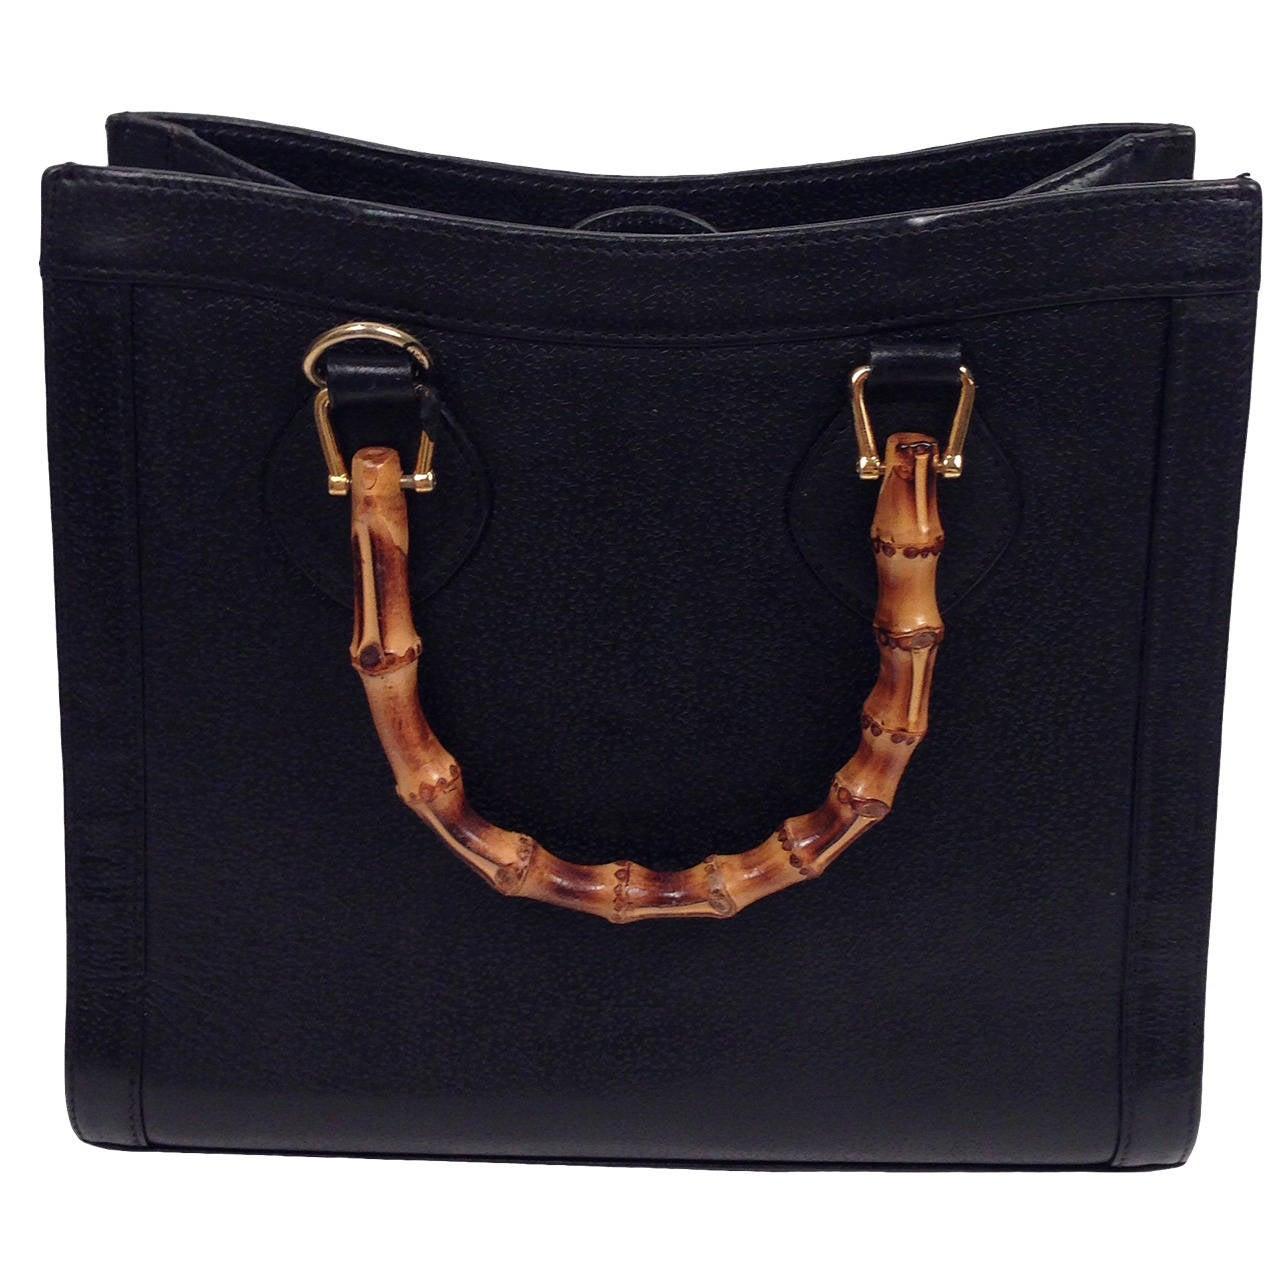 Asian styled bamboo handled purses handbags-6088